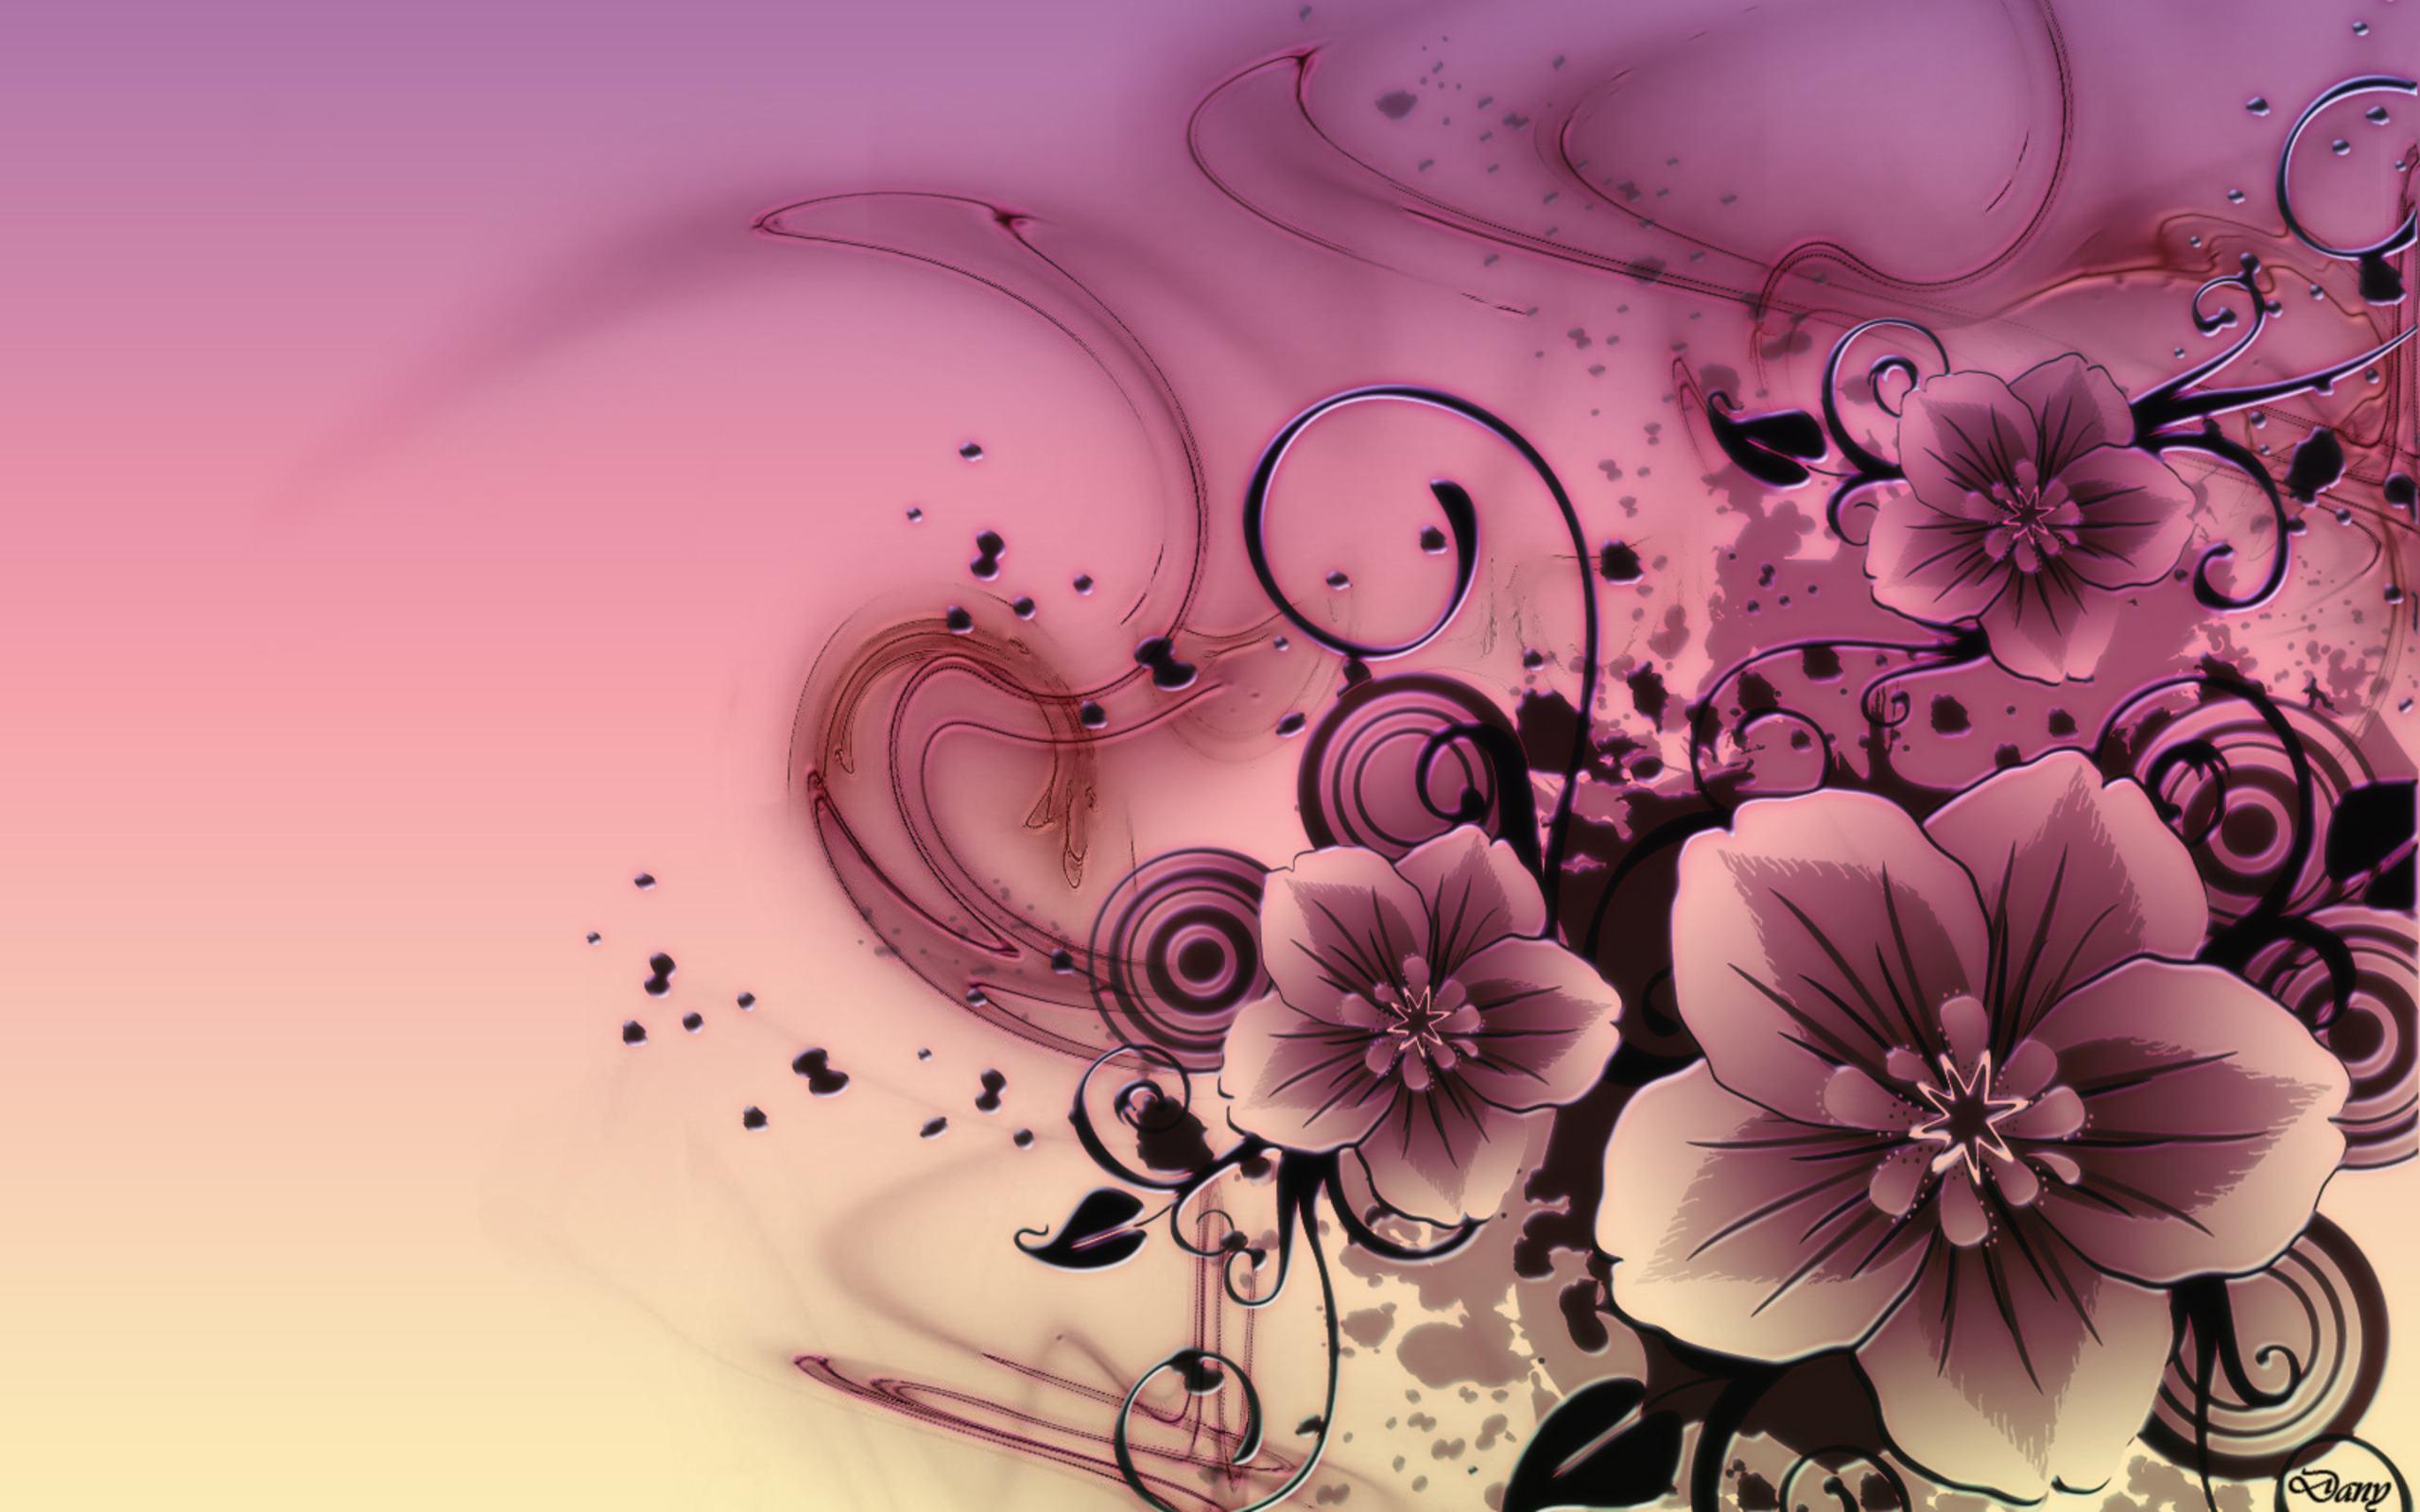 Cute Wallpapers For Desktop Background Full Screen